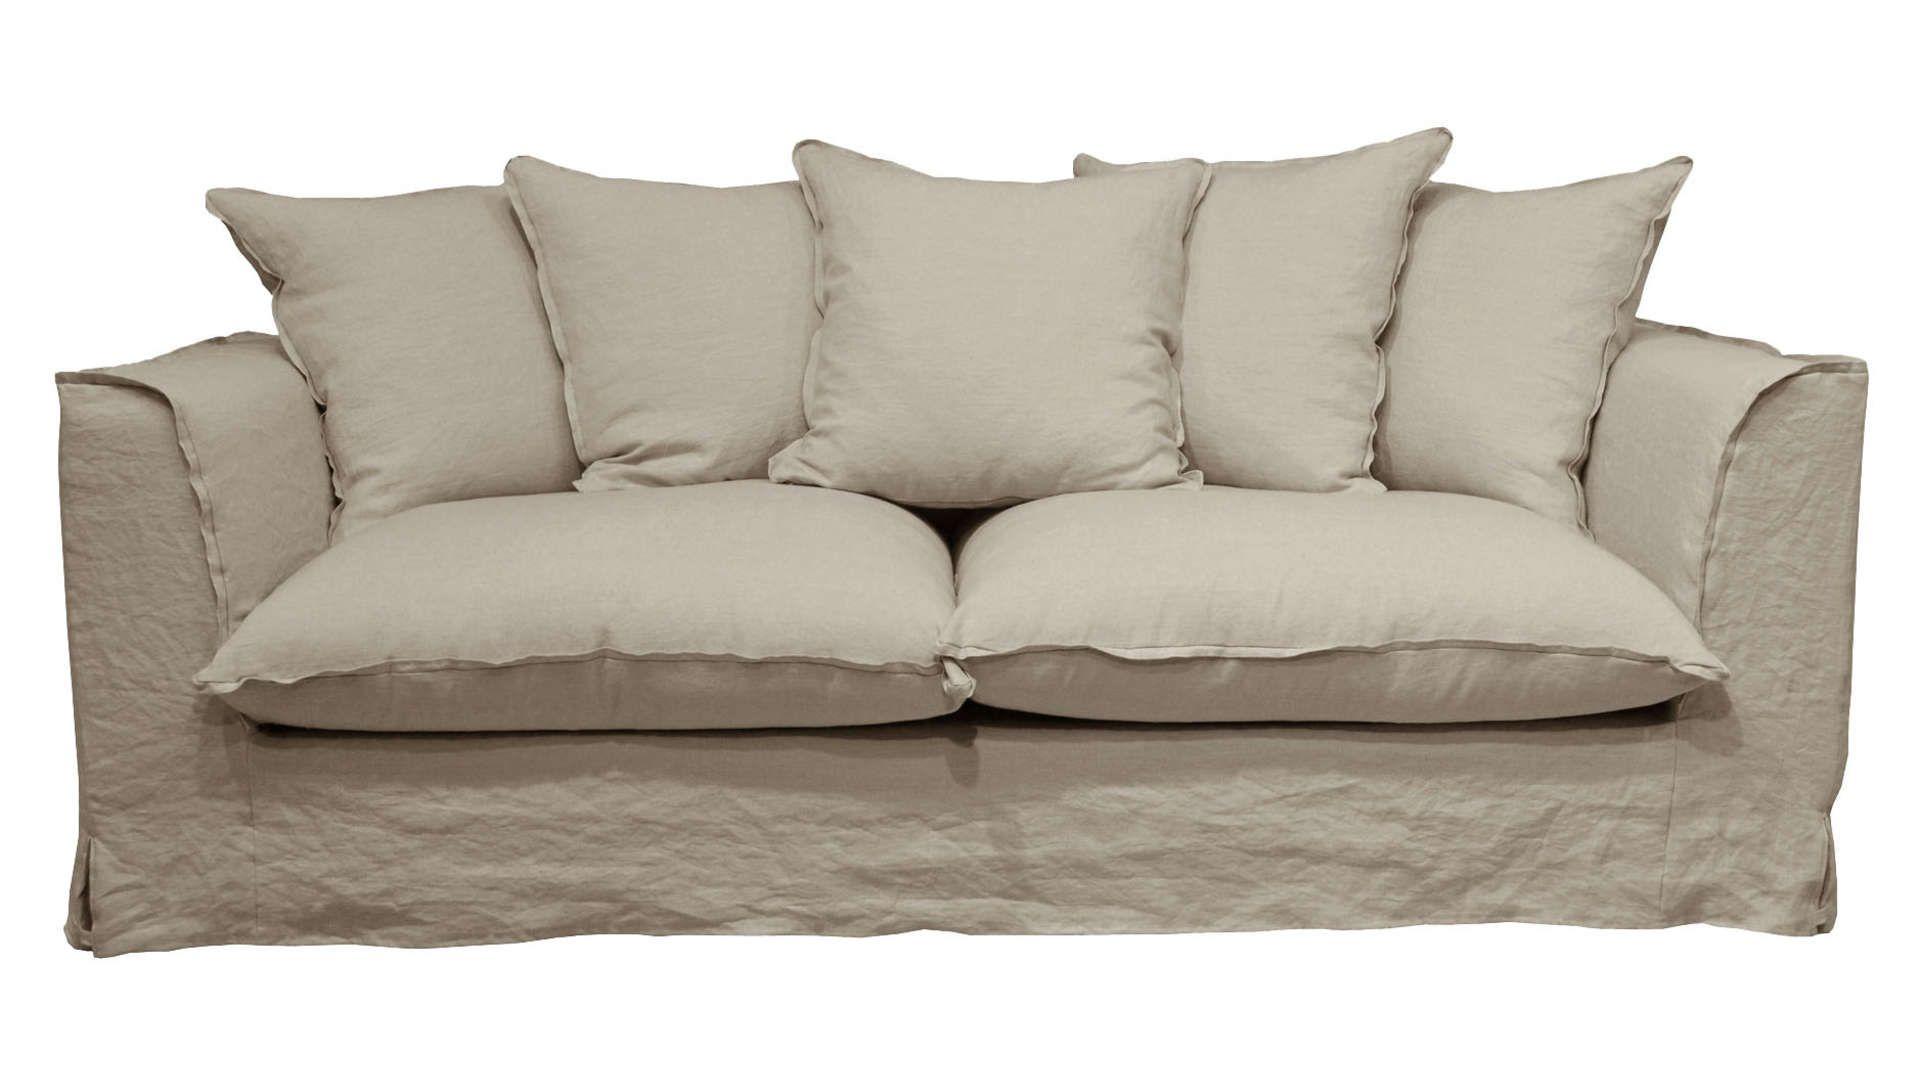 Canape Fixe 3 Places En Tissu Cocoon Coloris Ficelle Canape Fixe 3 Places Canape Fixe Et Canape Droit